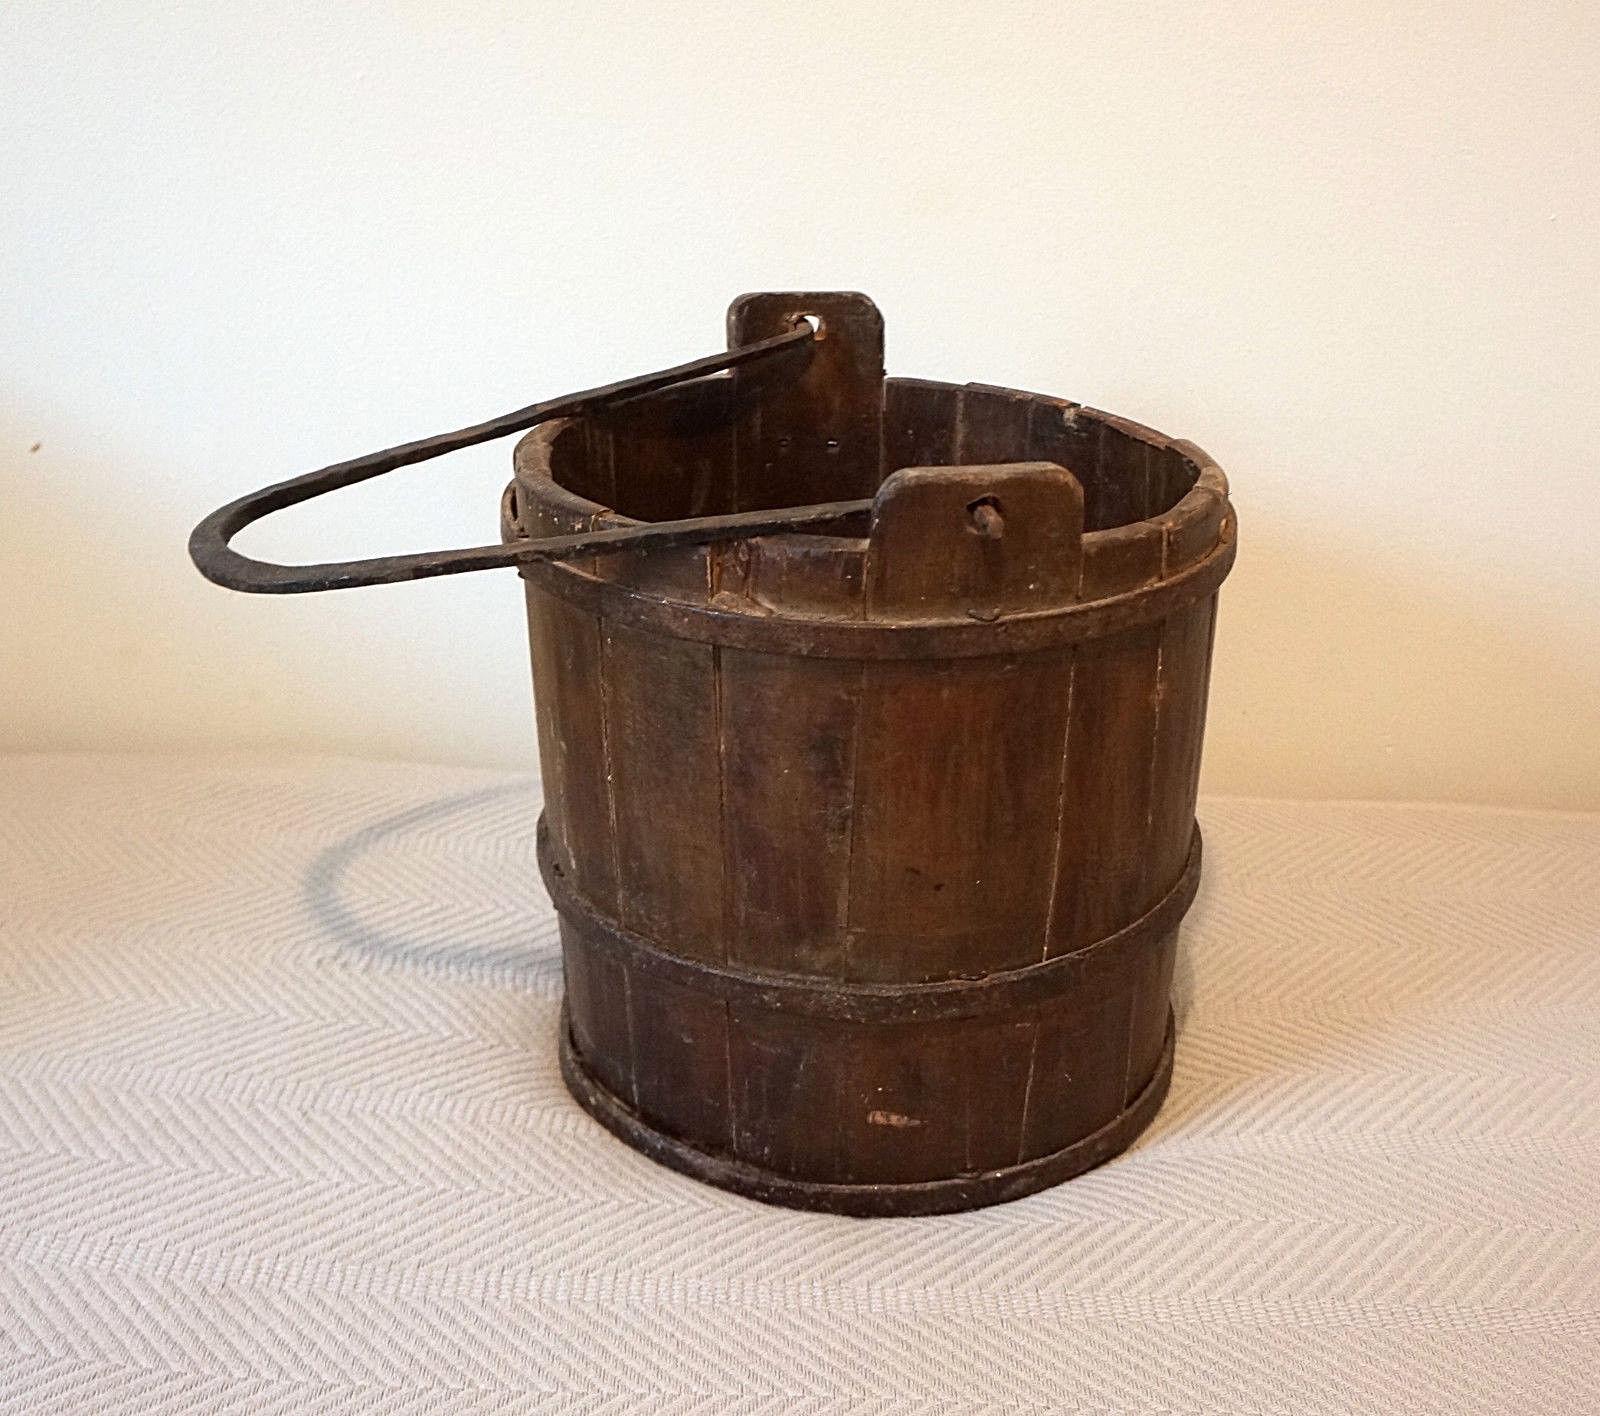 CAST IRON HERB HOOK Hand Forged Dryer Lancaster Pennsylvania Amish Blacksmith